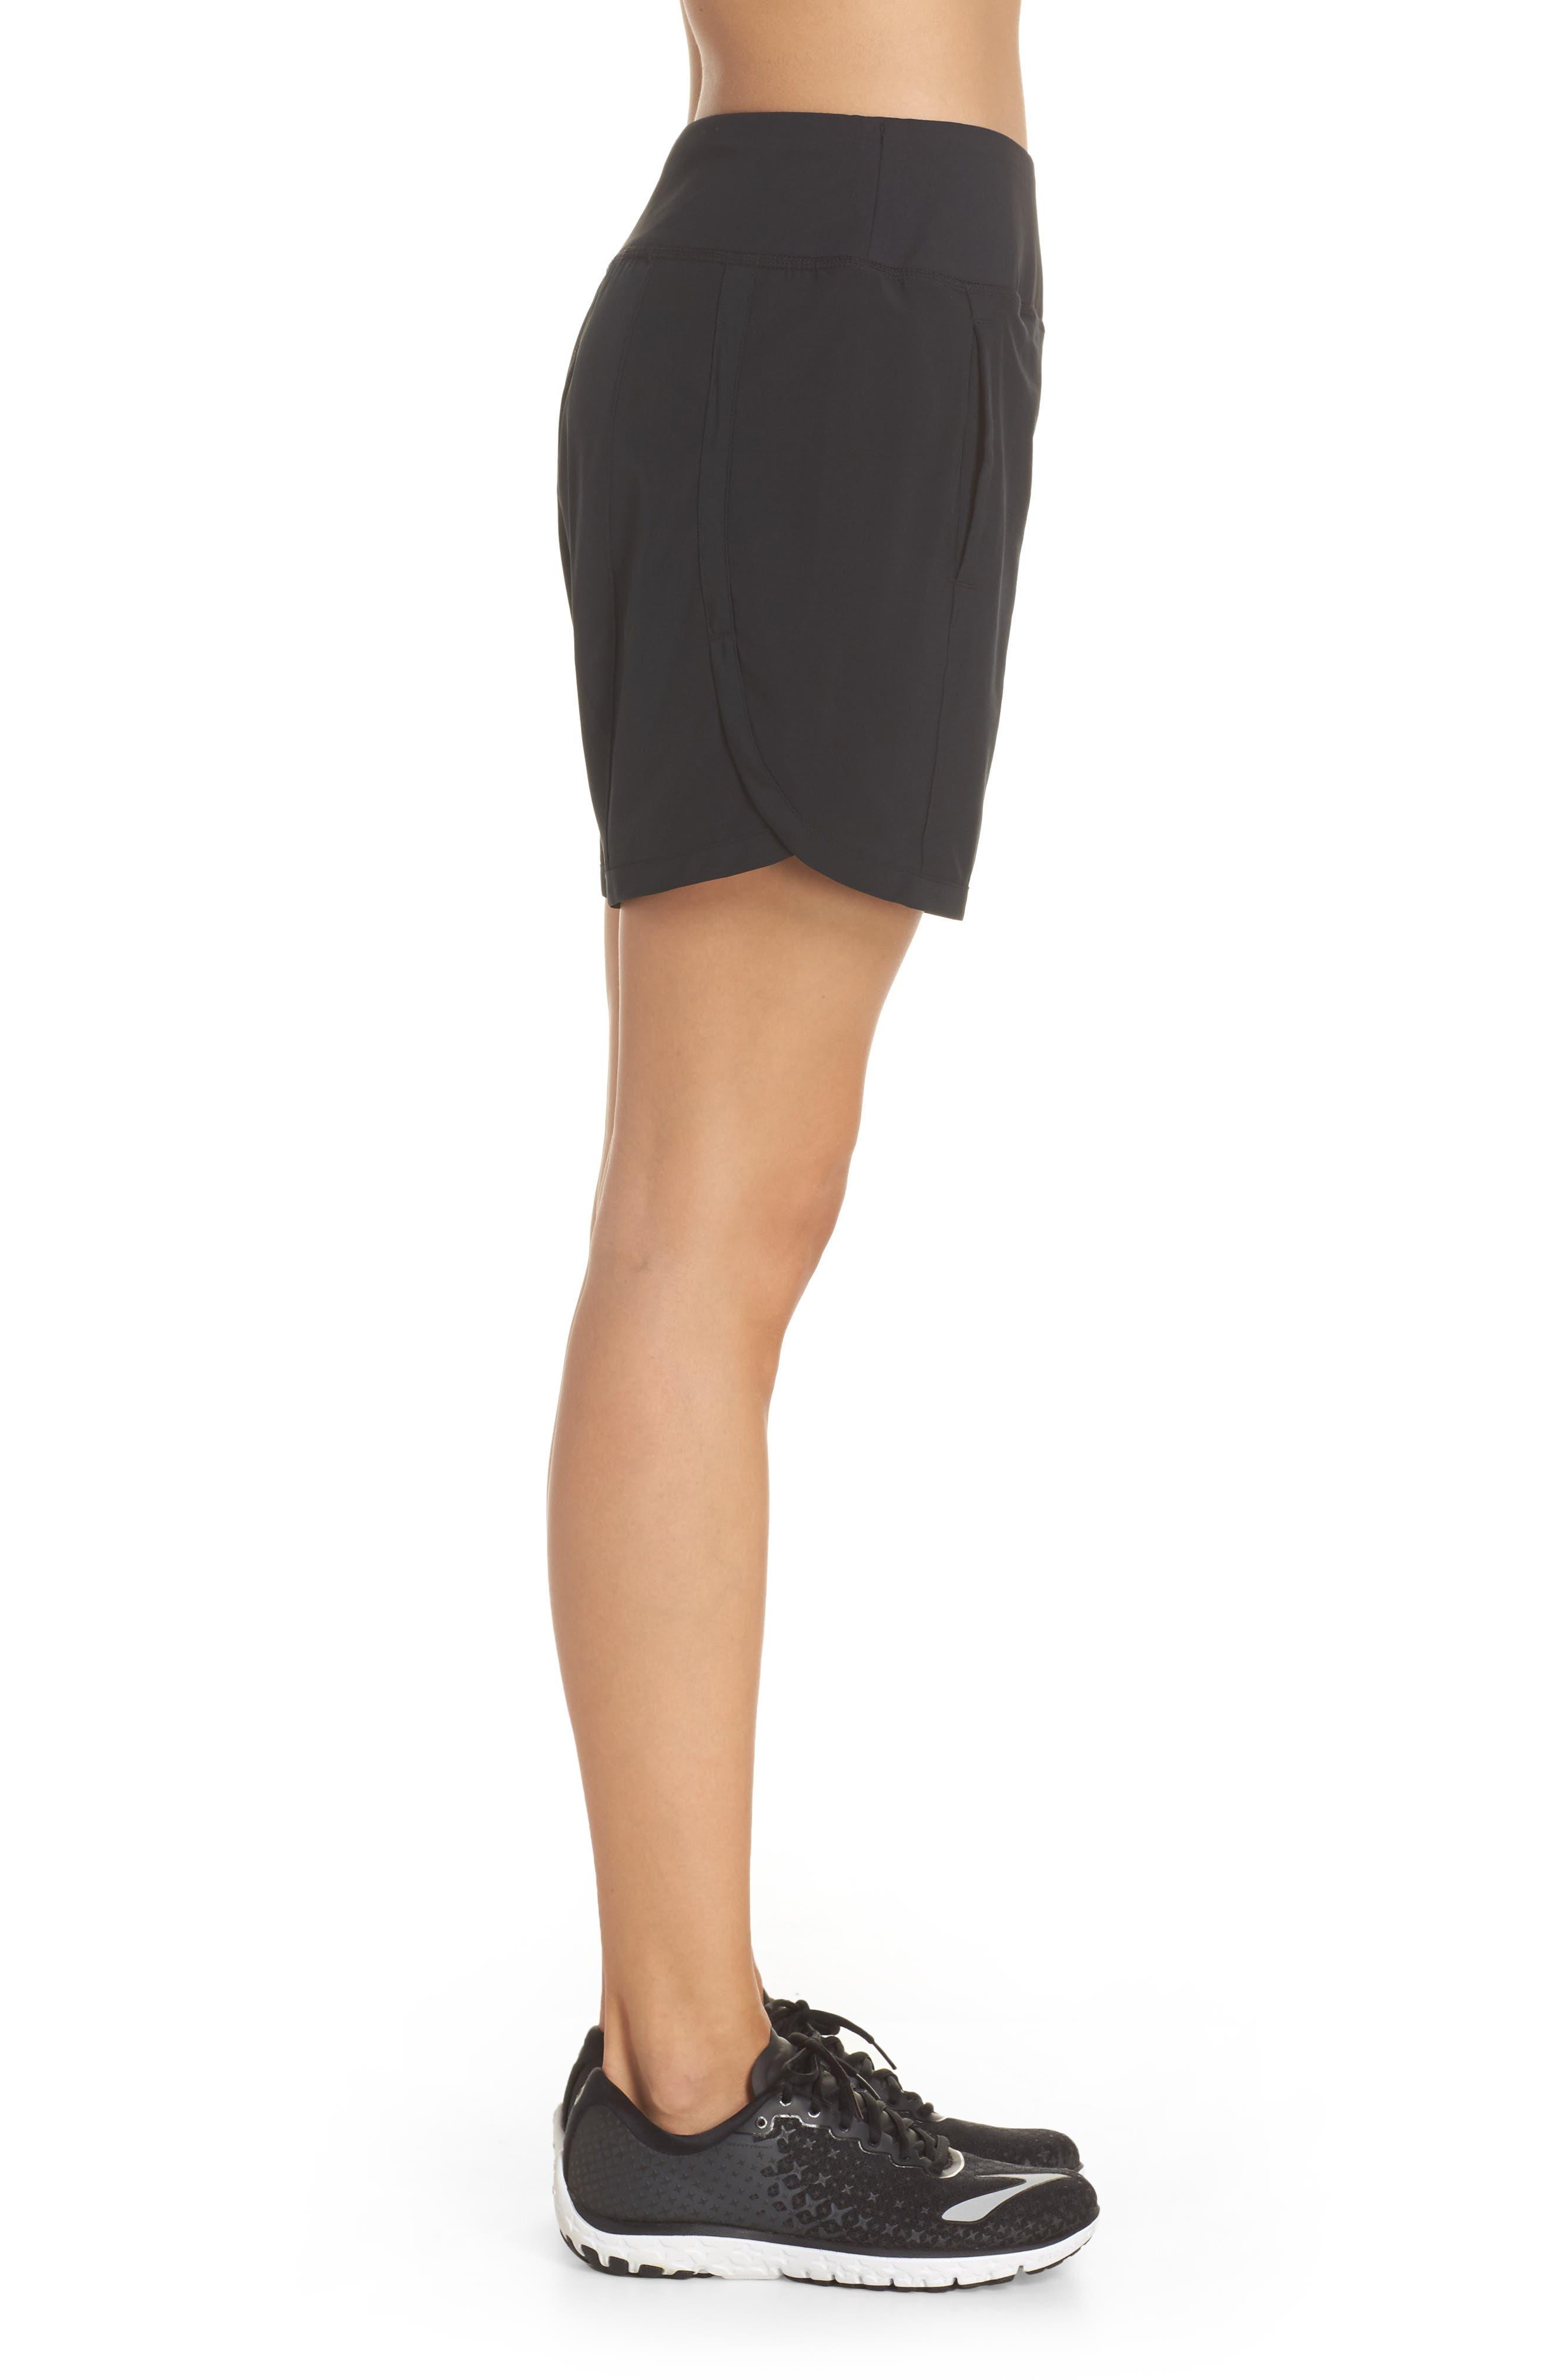 Chaser 7 Shorts,                             Alternate thumbnail 3, color,                             Black